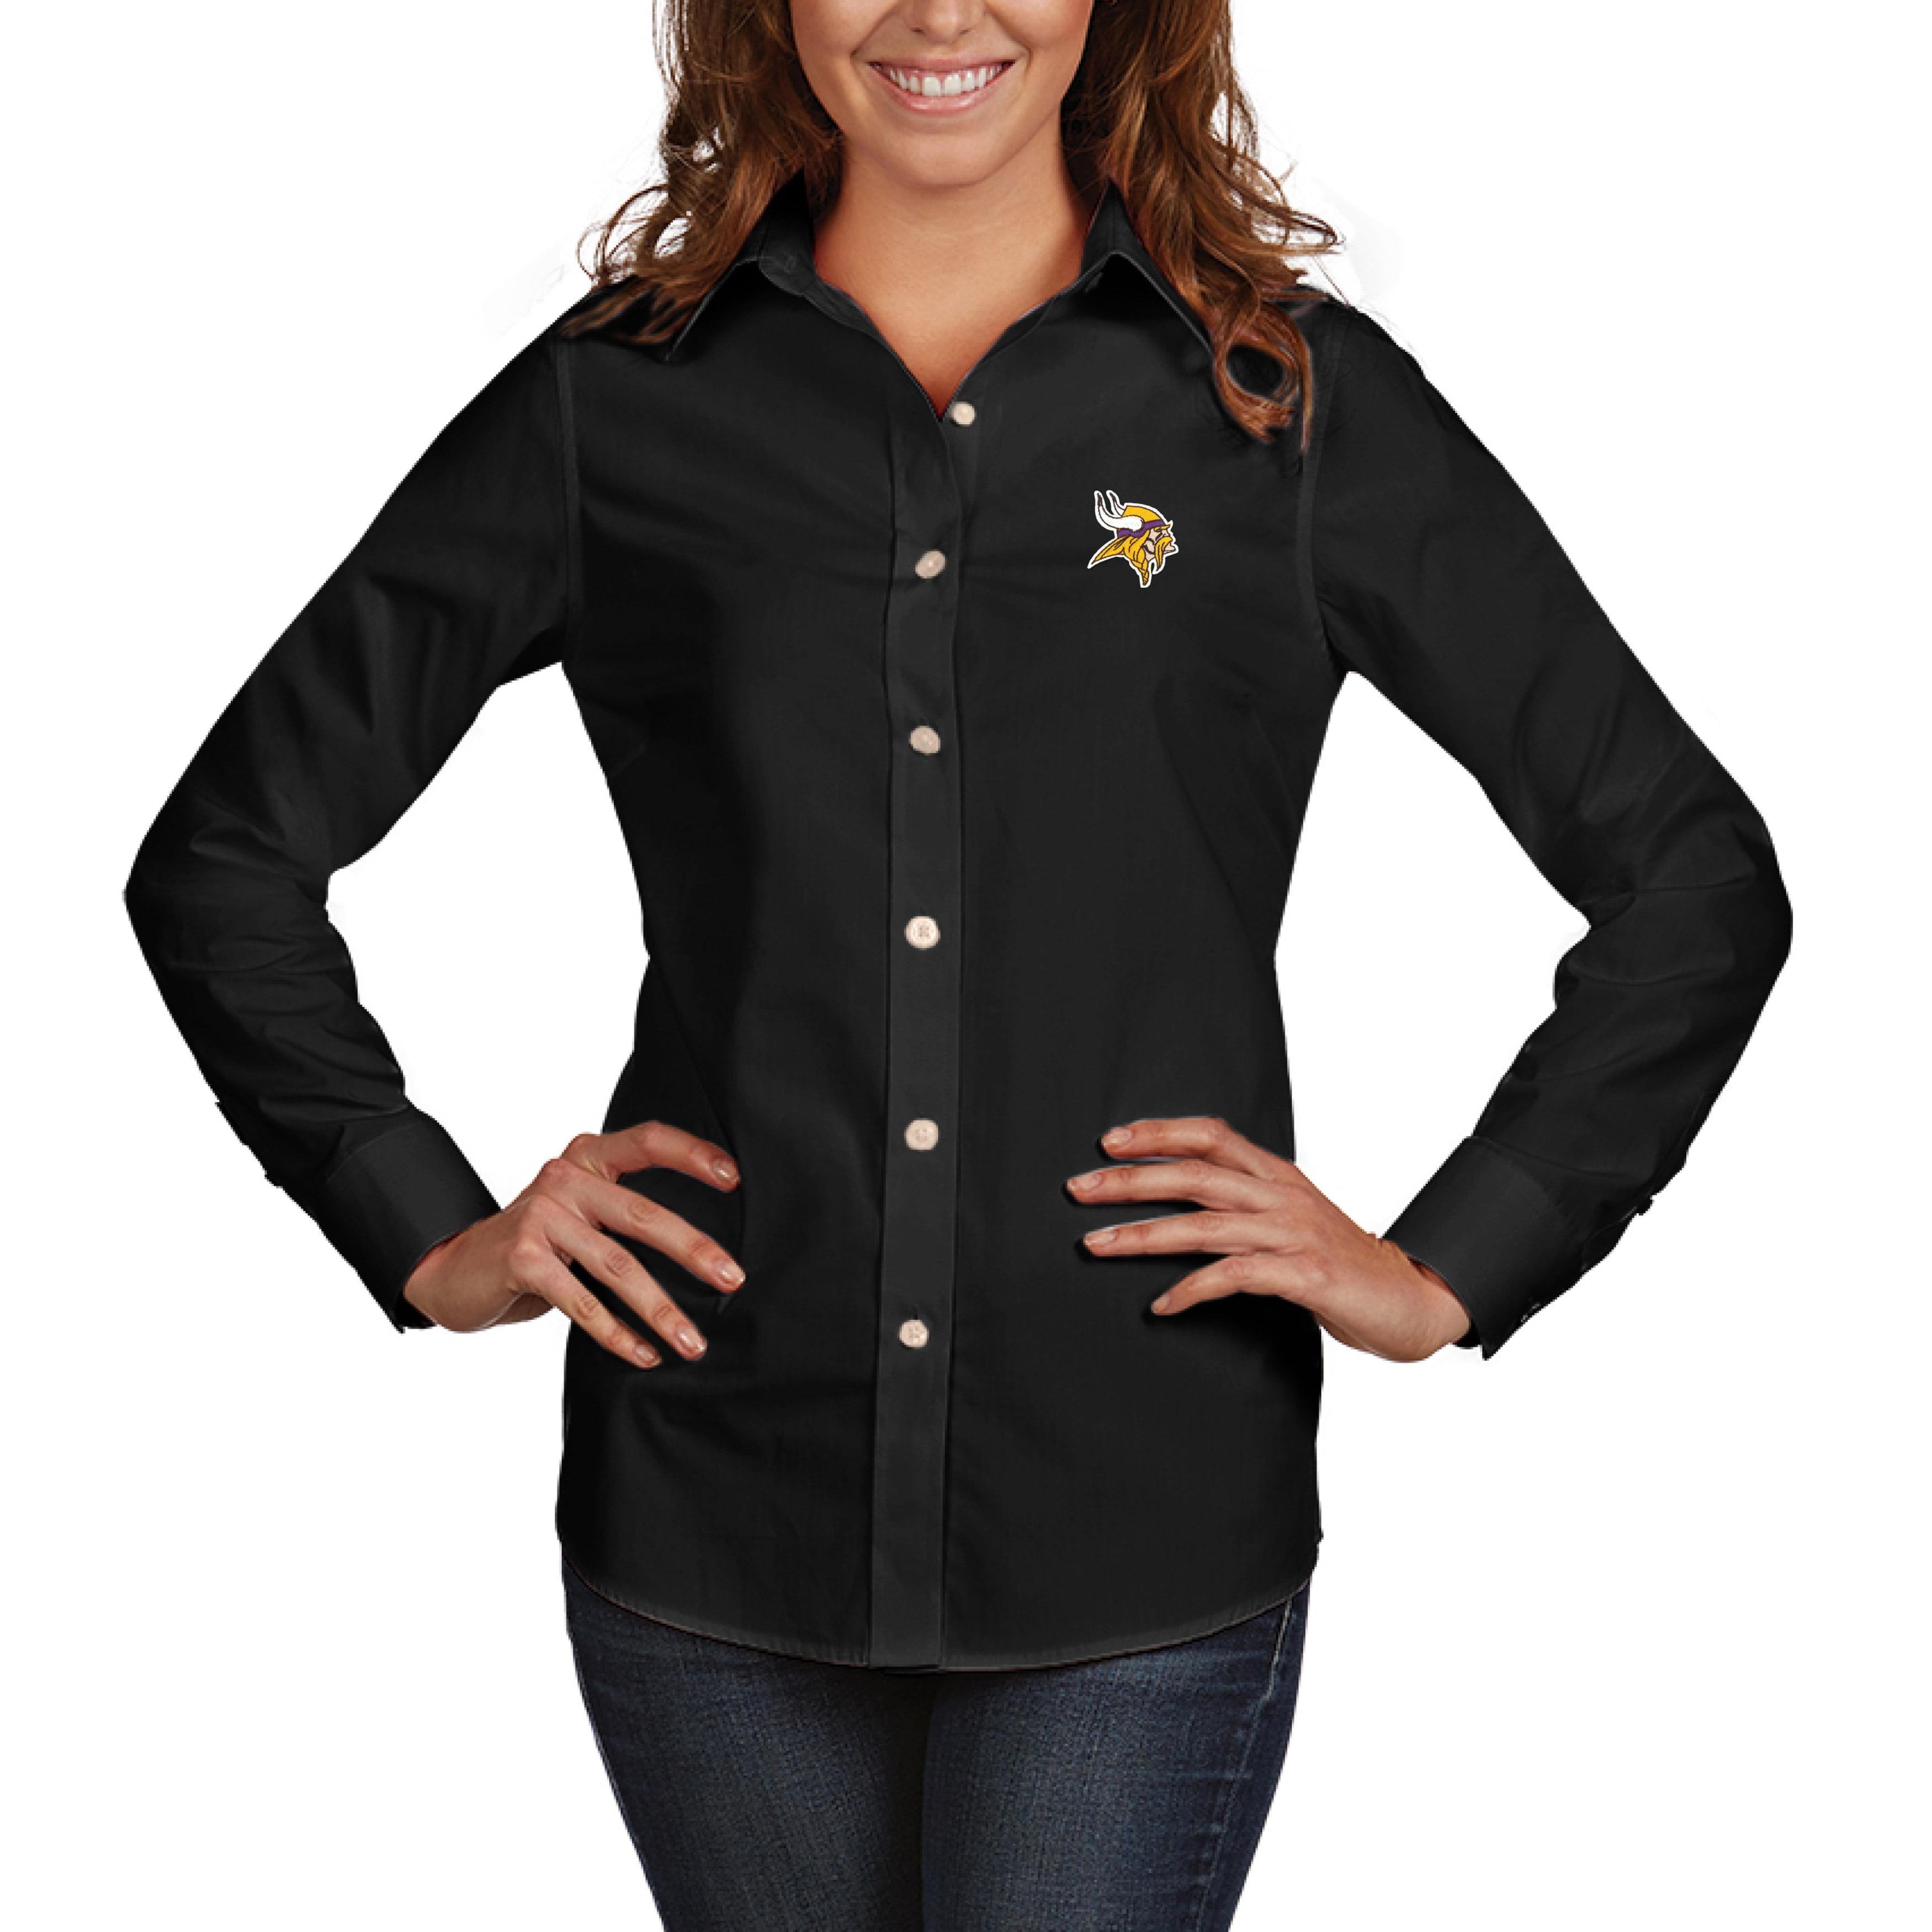 Minnesota Vikings Antigua Women's Dynasty Woven Button Up Long Sleeve Shirt - Black